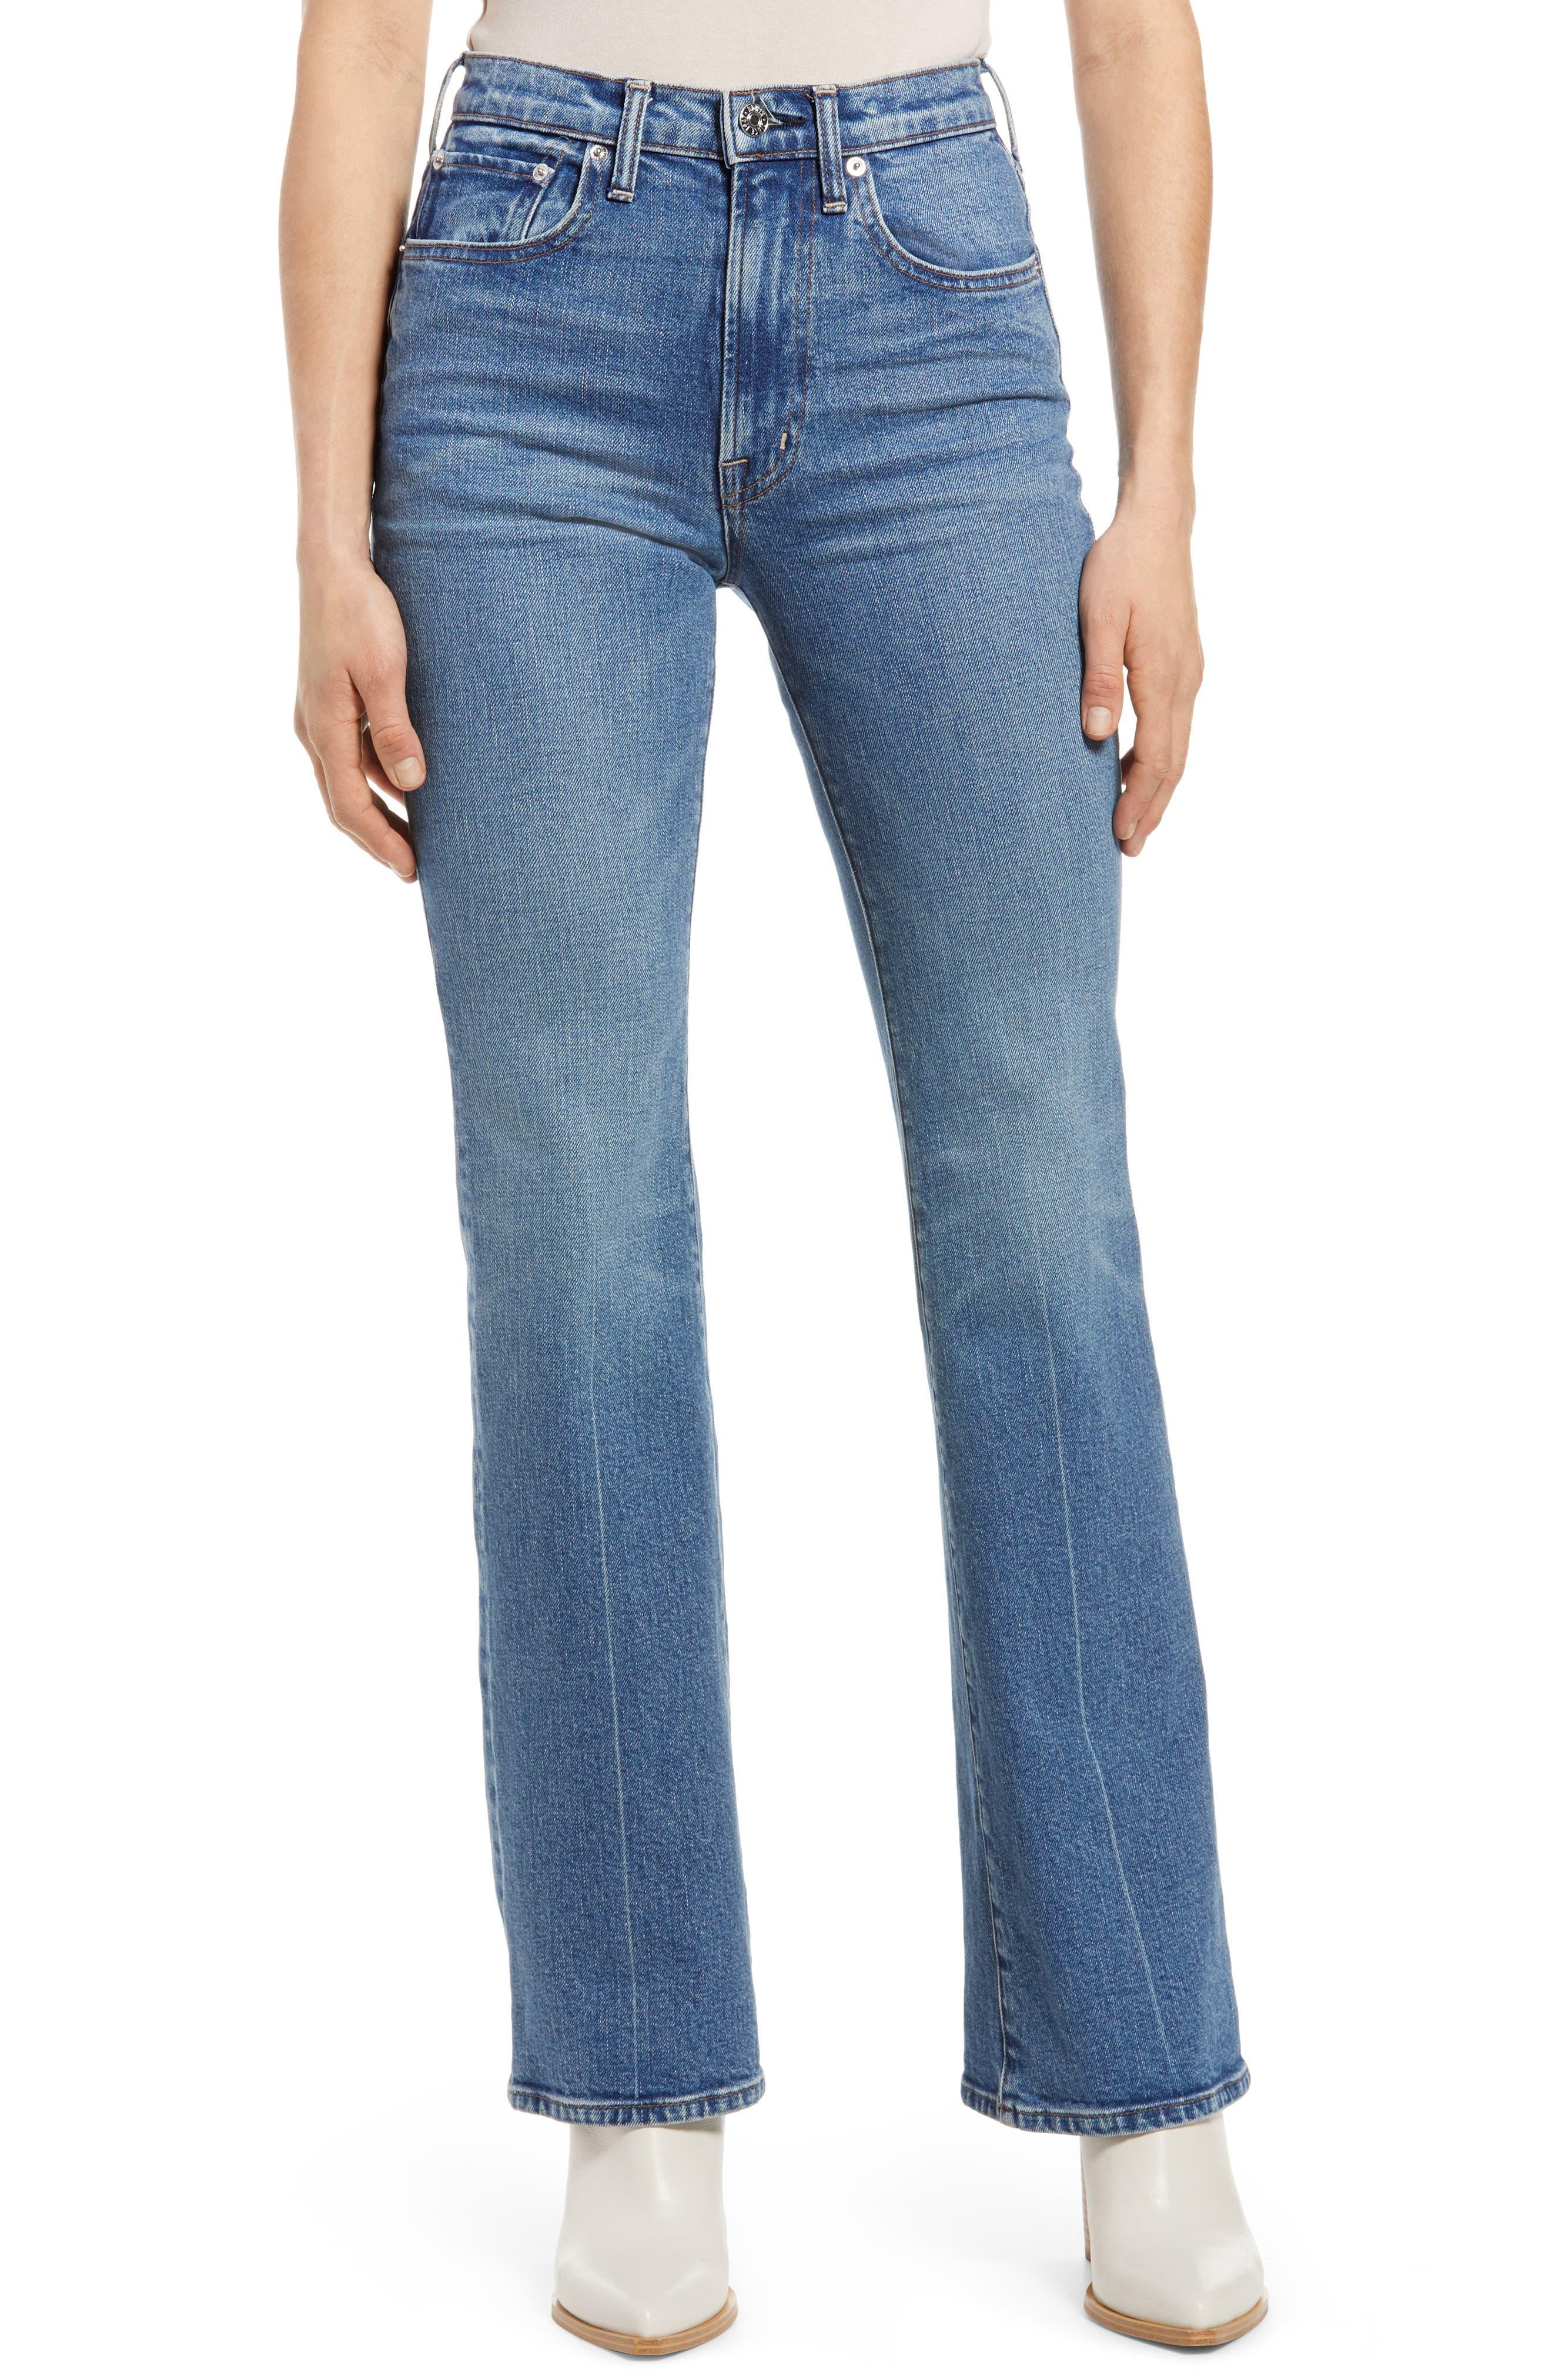 Ryder High Waist Flare Jeans